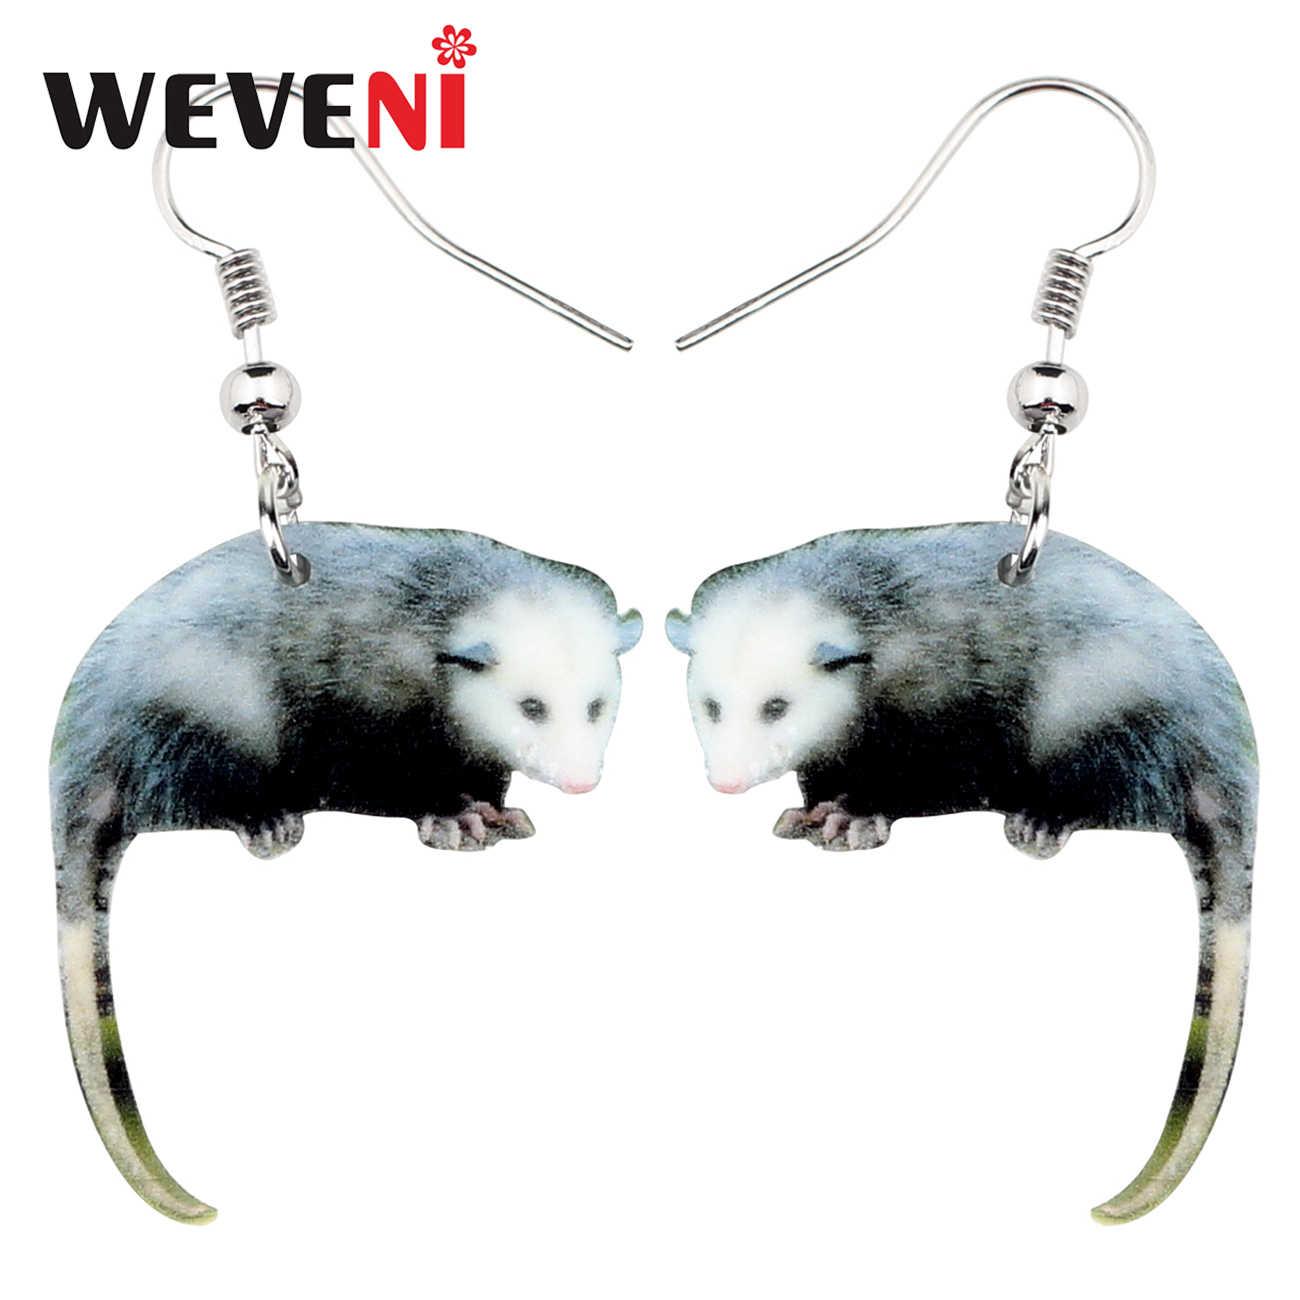 Weveni Akrilik Liar Possum Anting-Anting Drop Menjuntai Lucu Hewan Perhiasan untuk Wanita Gadis Hadiah Pesona Grosir Aksesoris Brincos